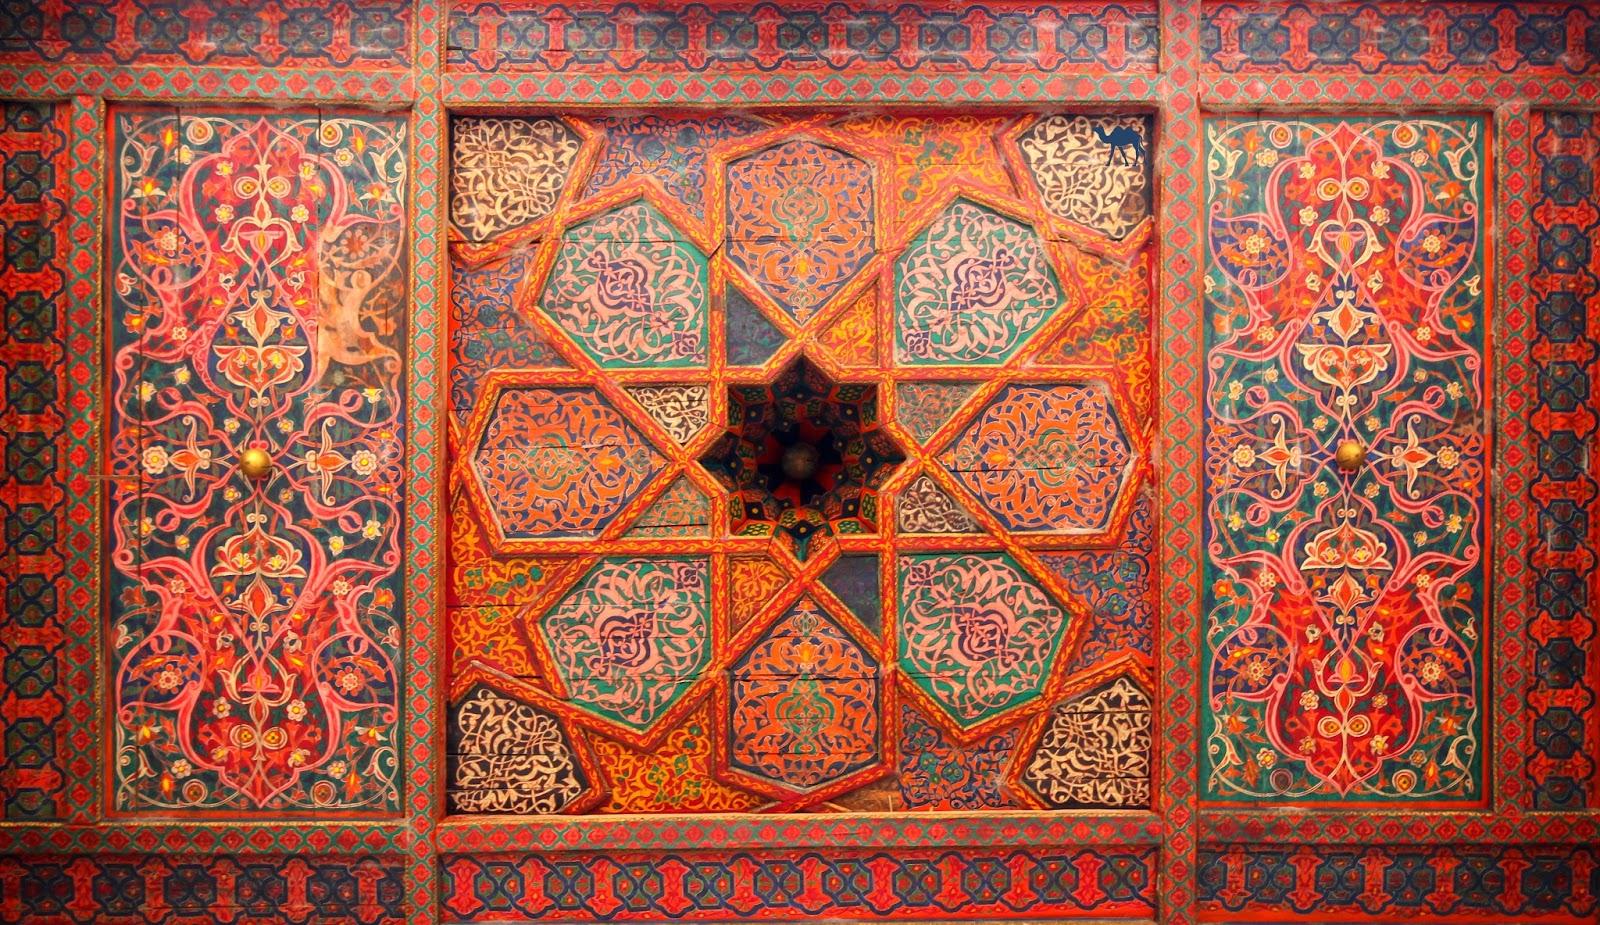 Le Chameau Bleu - Plafond du Harem - Khiva - Roadtrip en Ouzbékistan